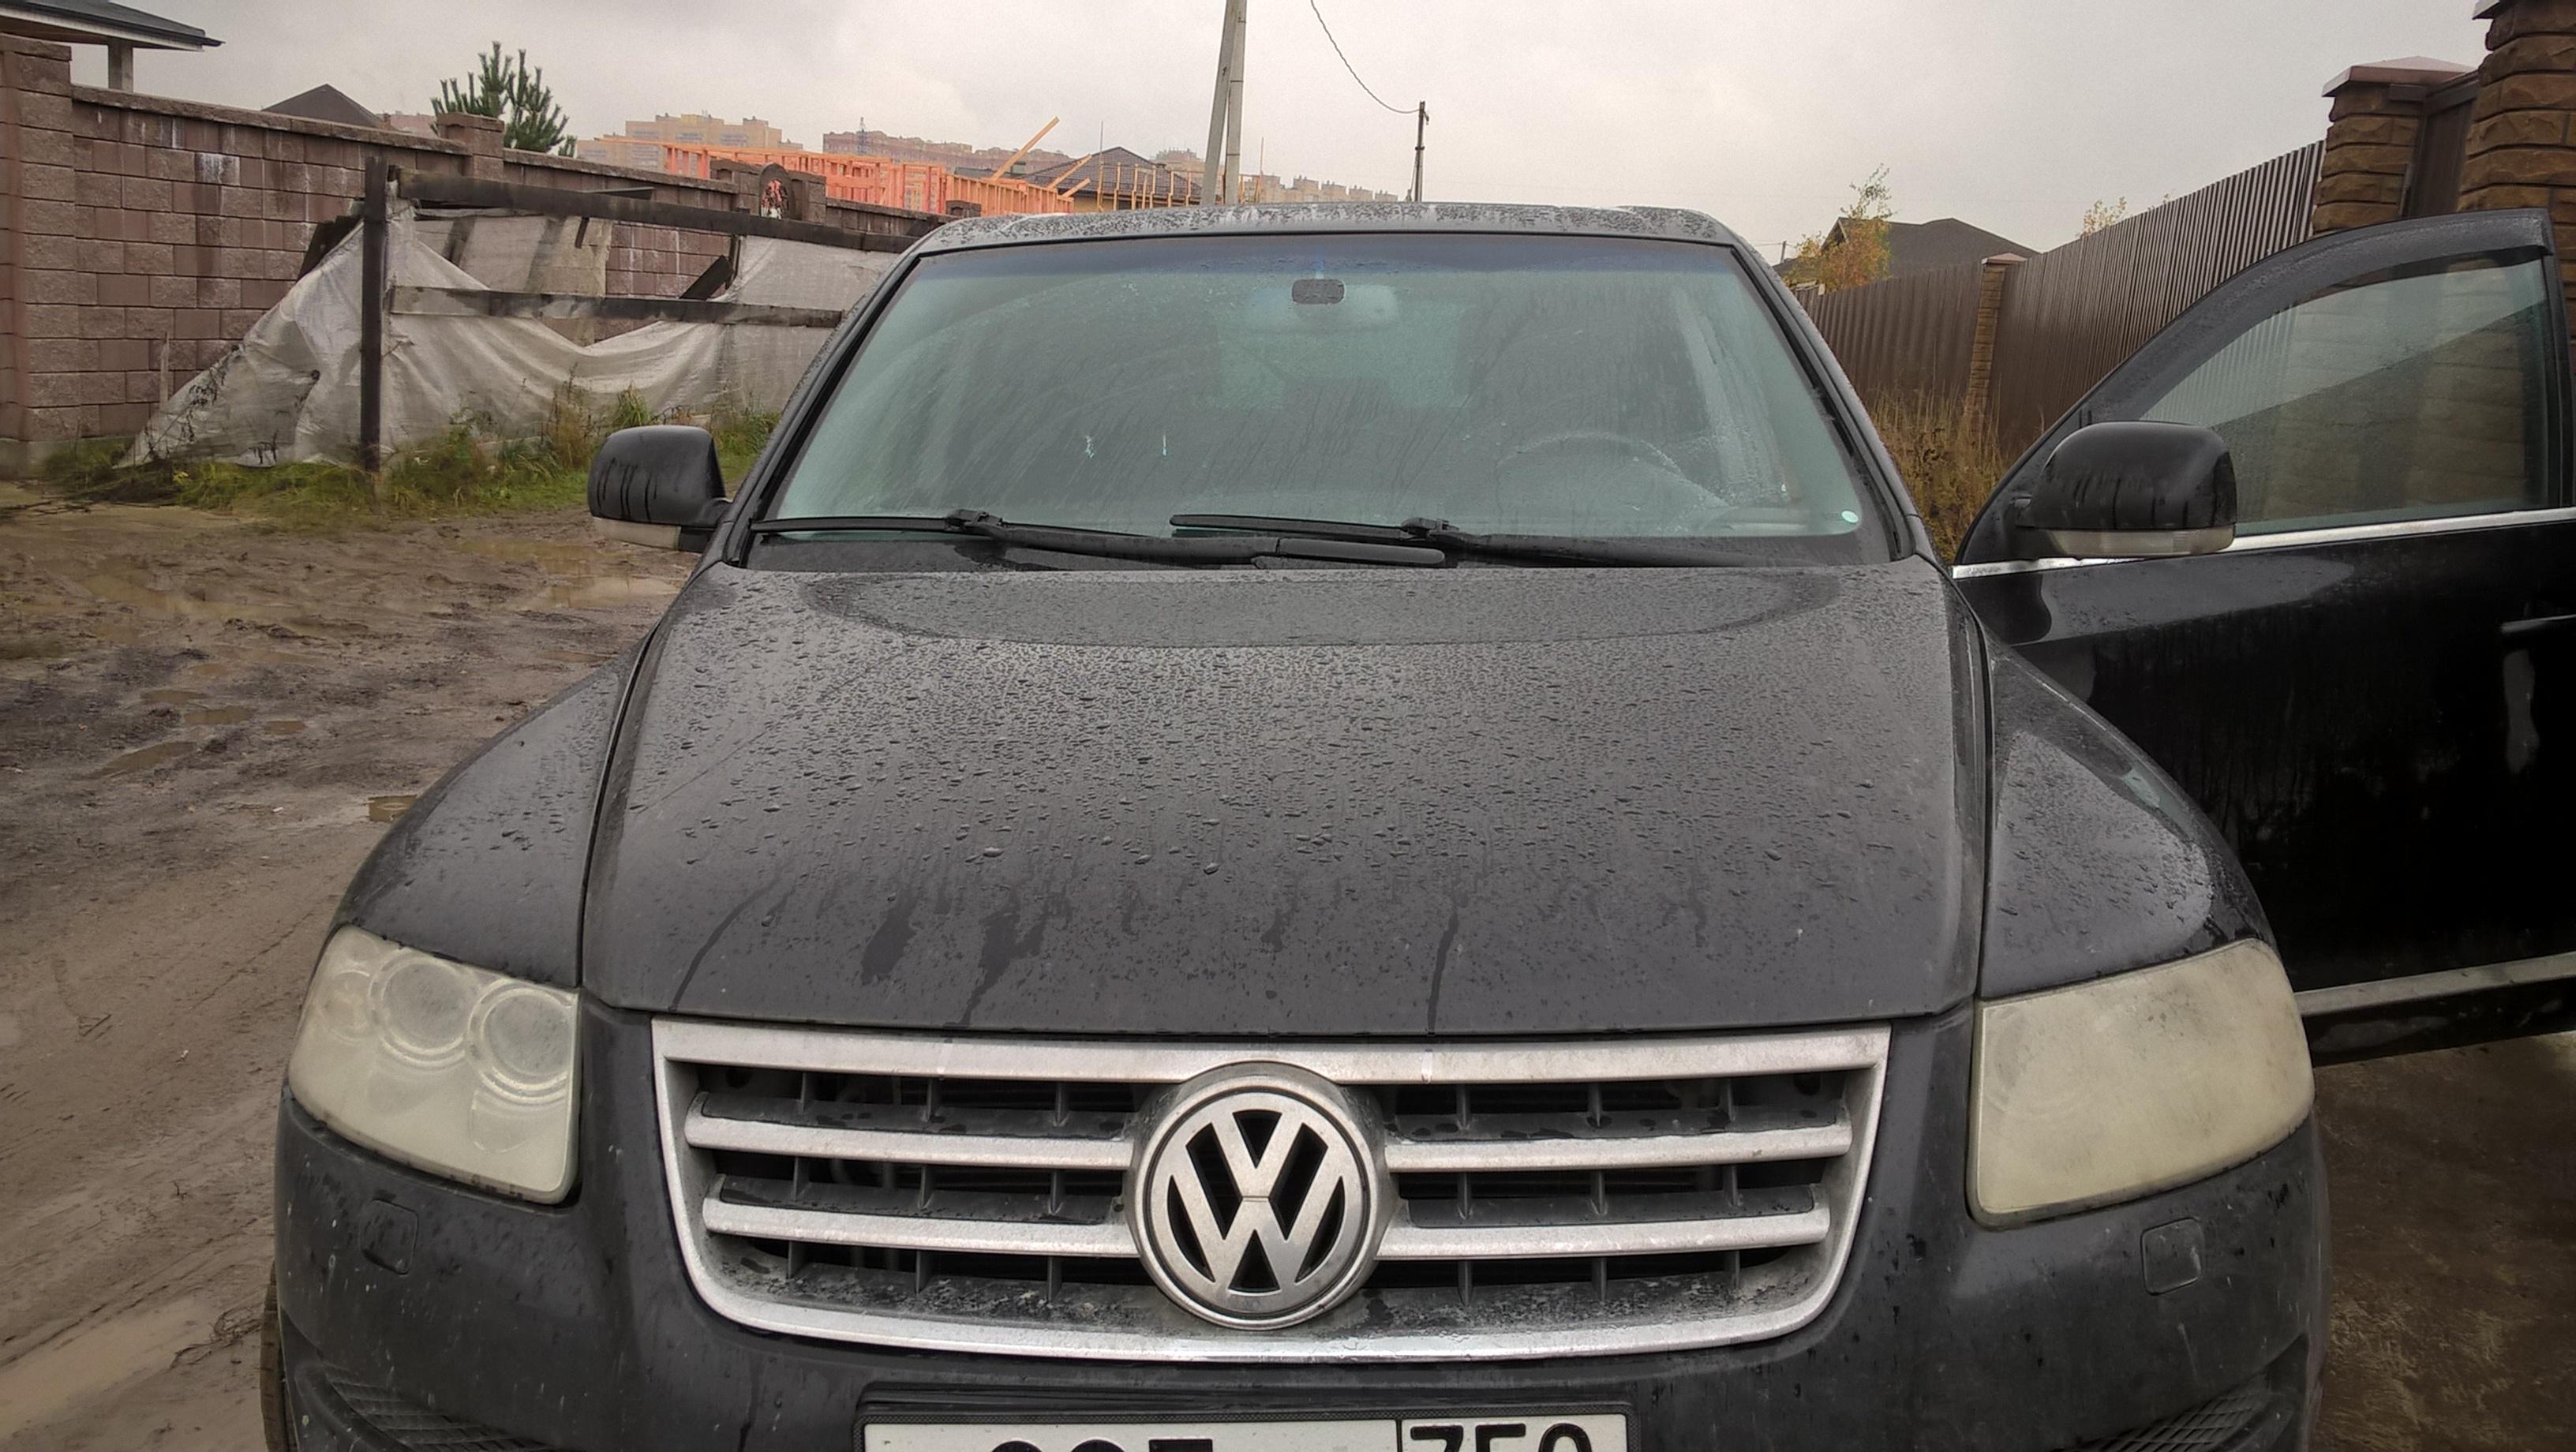 Чип-тюнинг VW Touareg 4.2 литра бензин